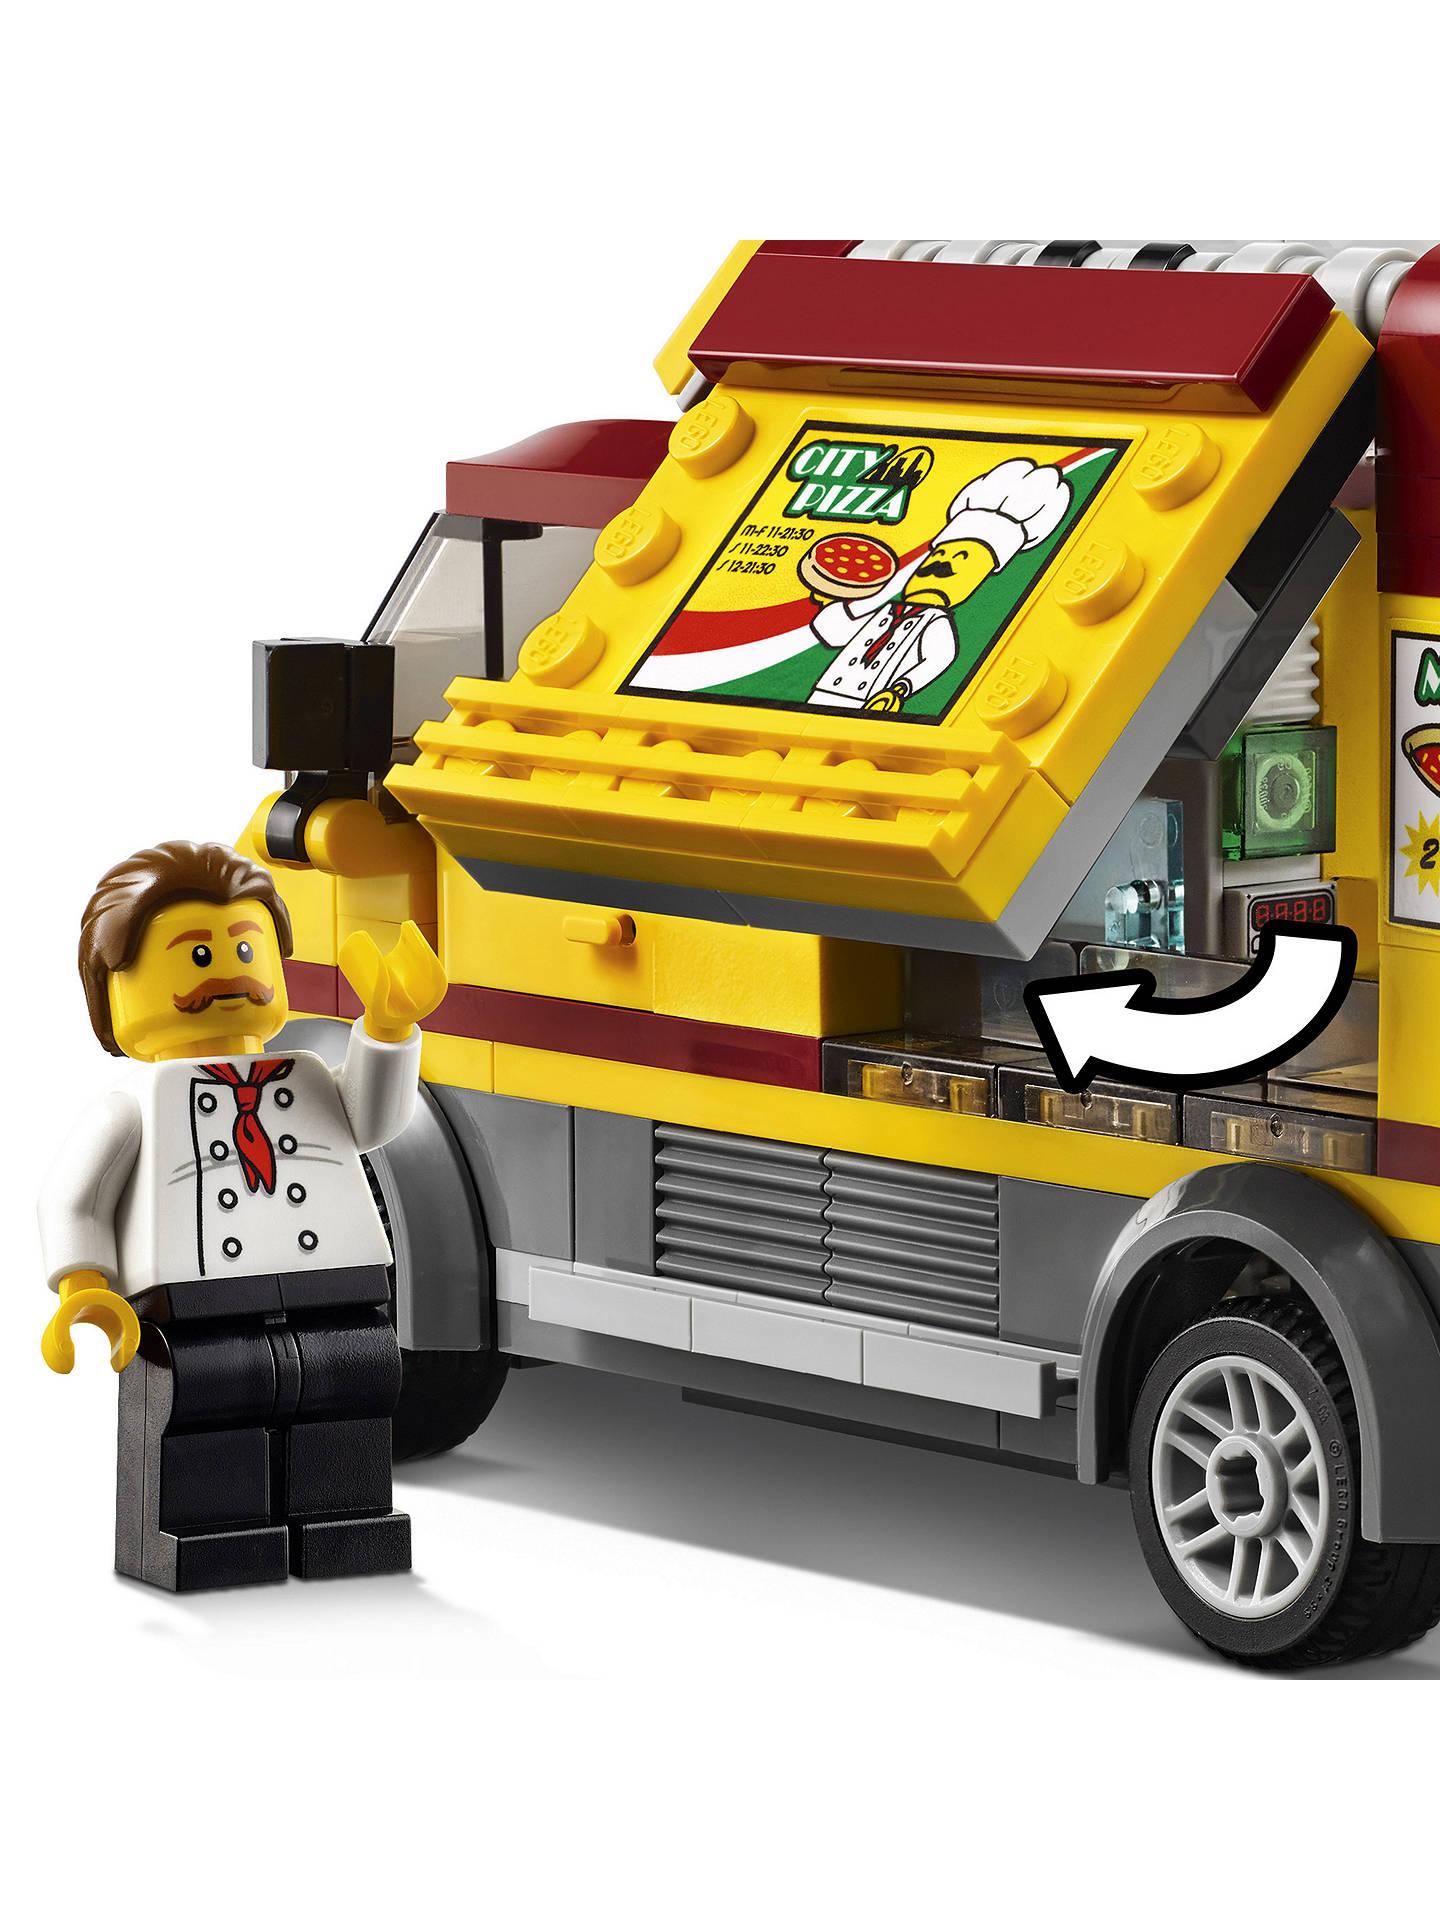 Lego City 60150 Pizza Van